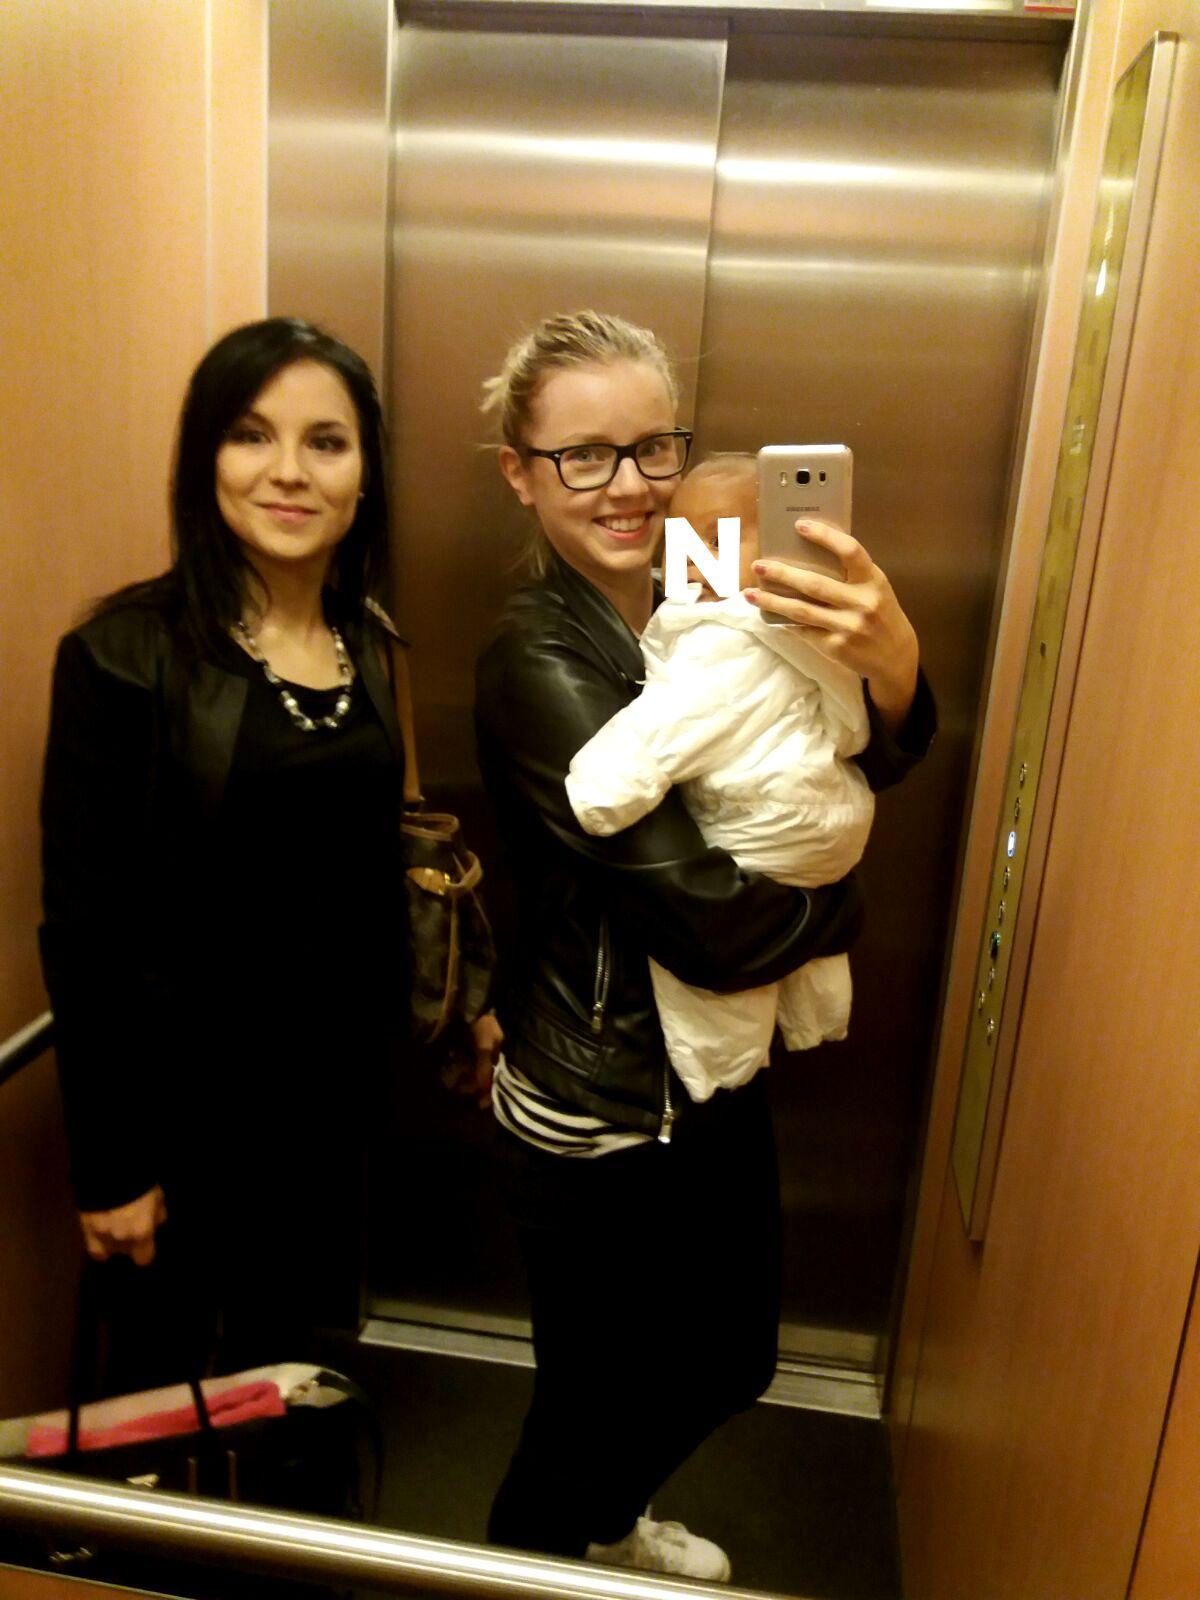 hississänew.jpg